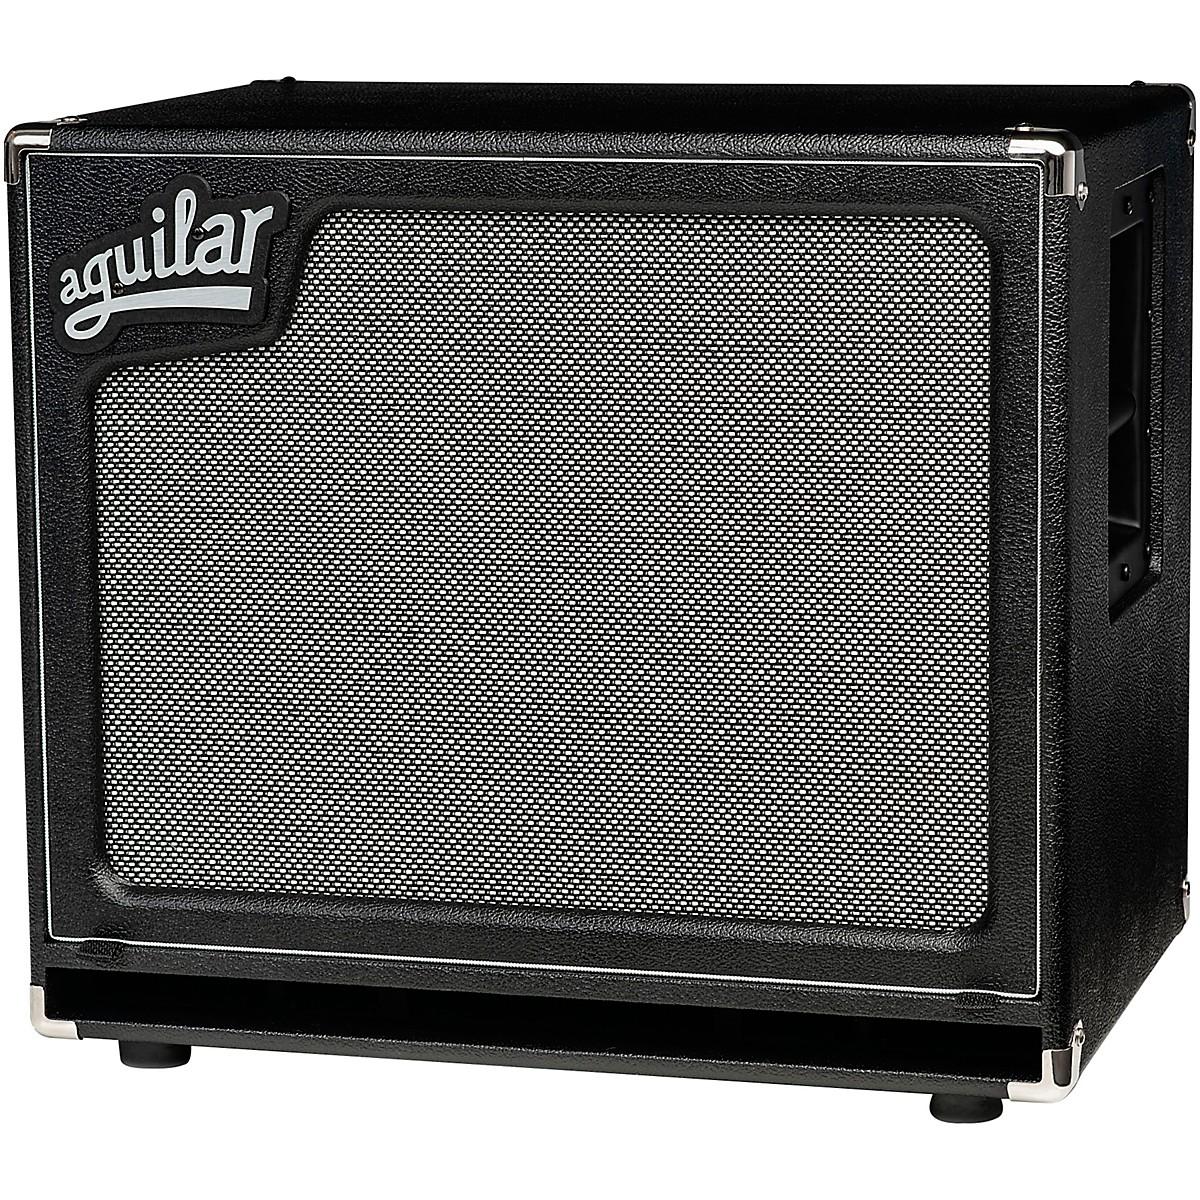 Aguilar SL 115 400W 1x15 Bass Speaker Cabinet